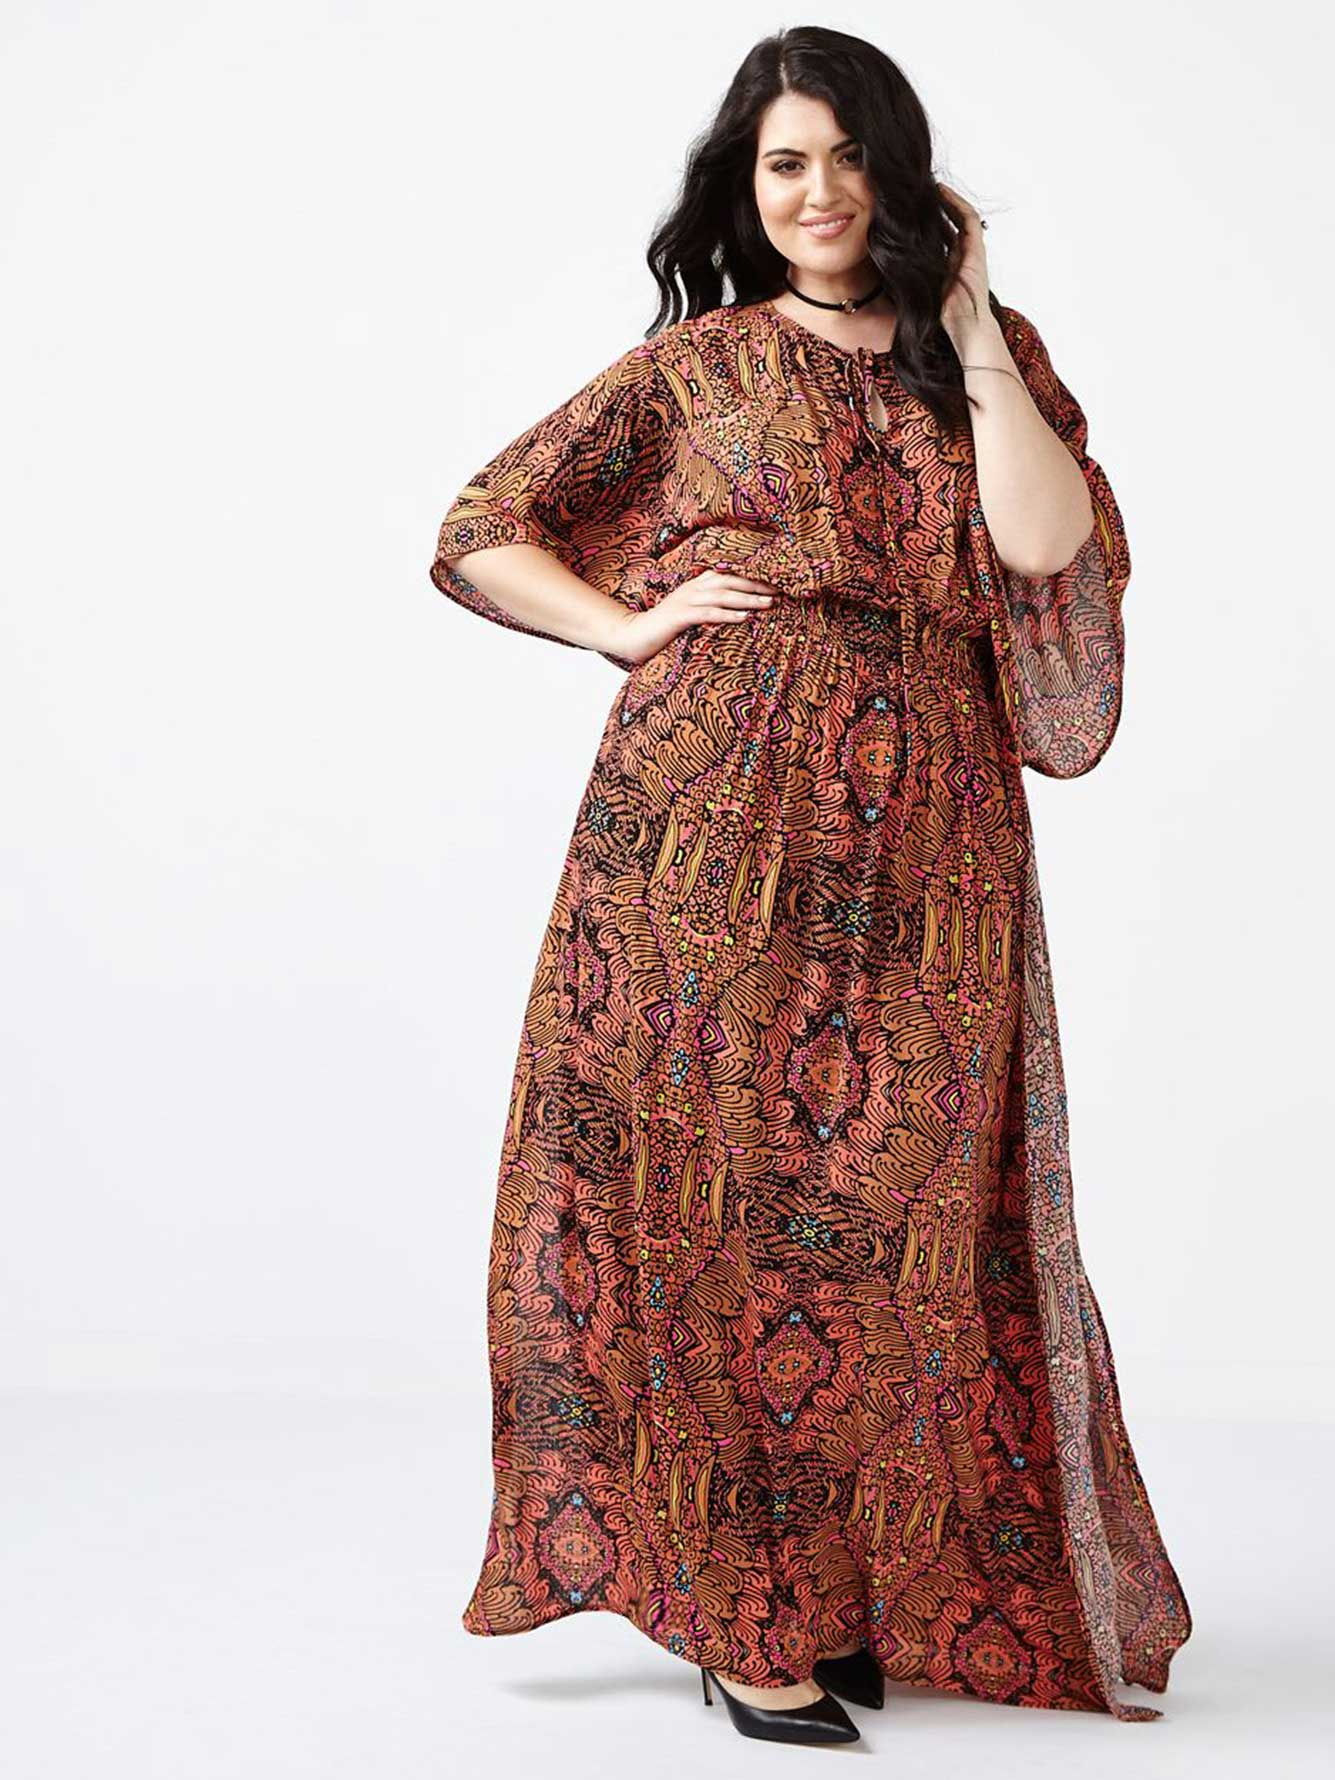 028a96cc471 Plus Size Clothing - Stylish   Trendy Plus Size Fashions